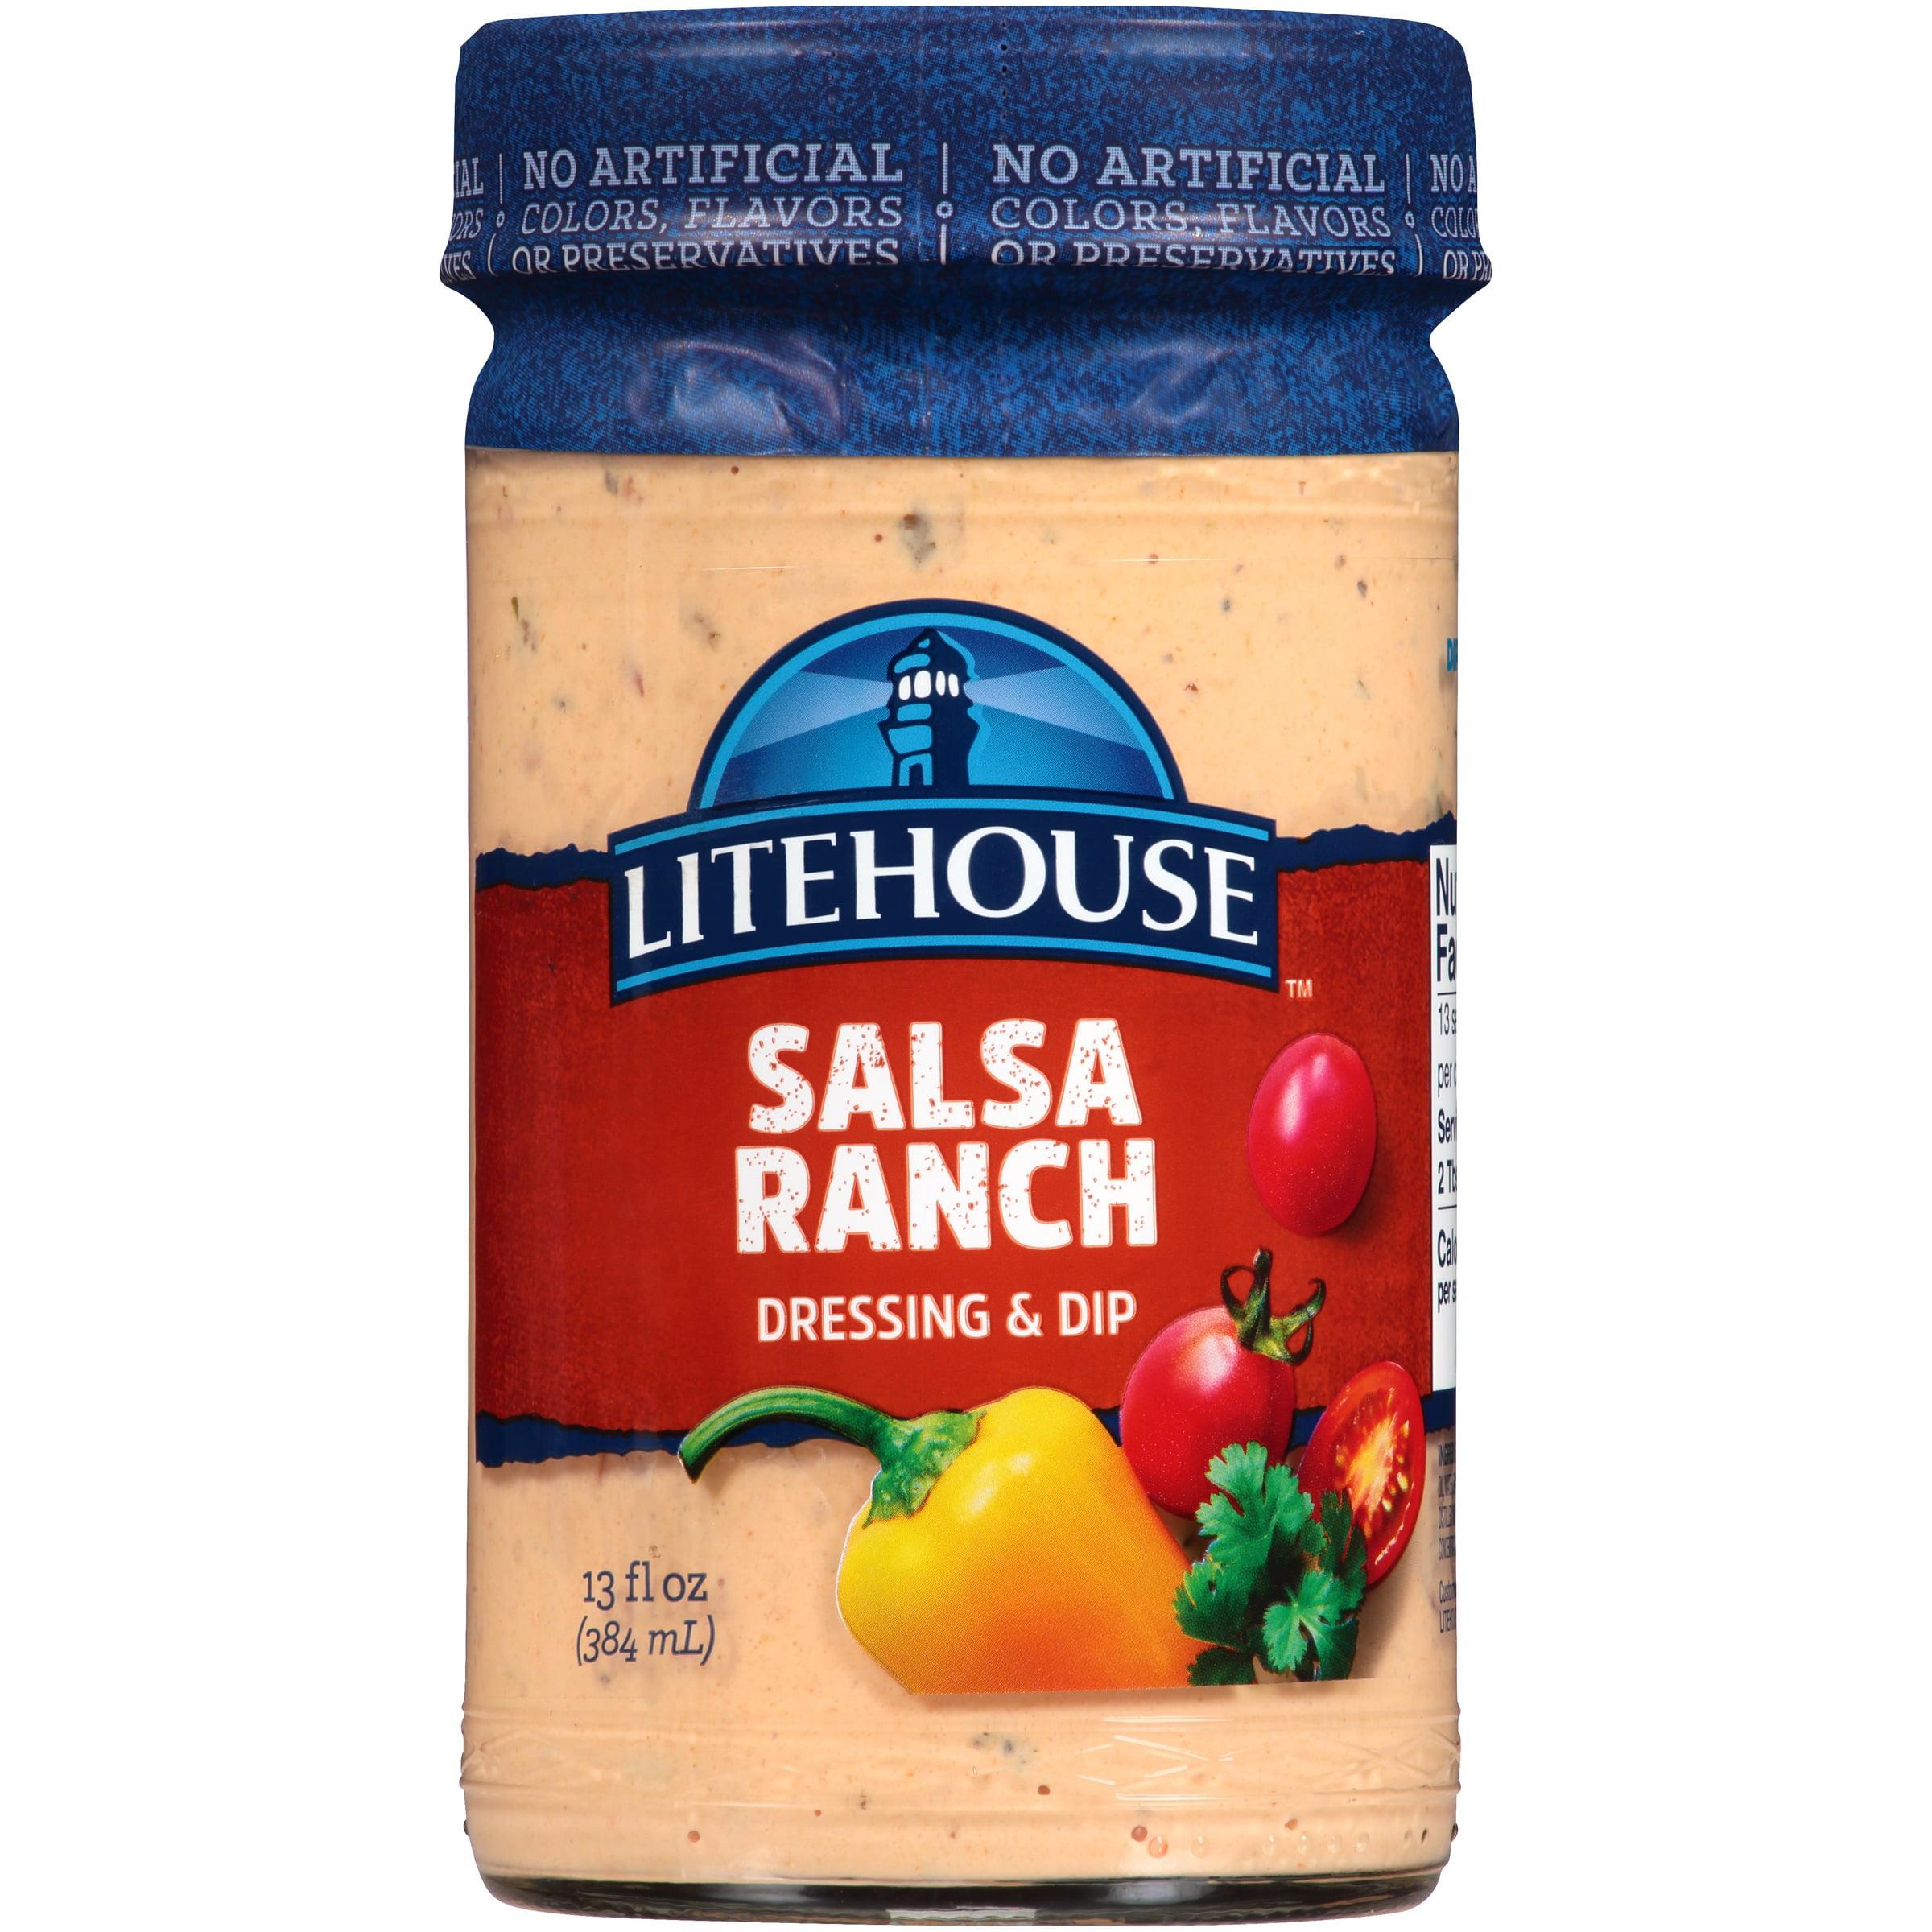 Litehouse™ Salsa Ranch Dressing & Dip 13 fl. oz. Jar